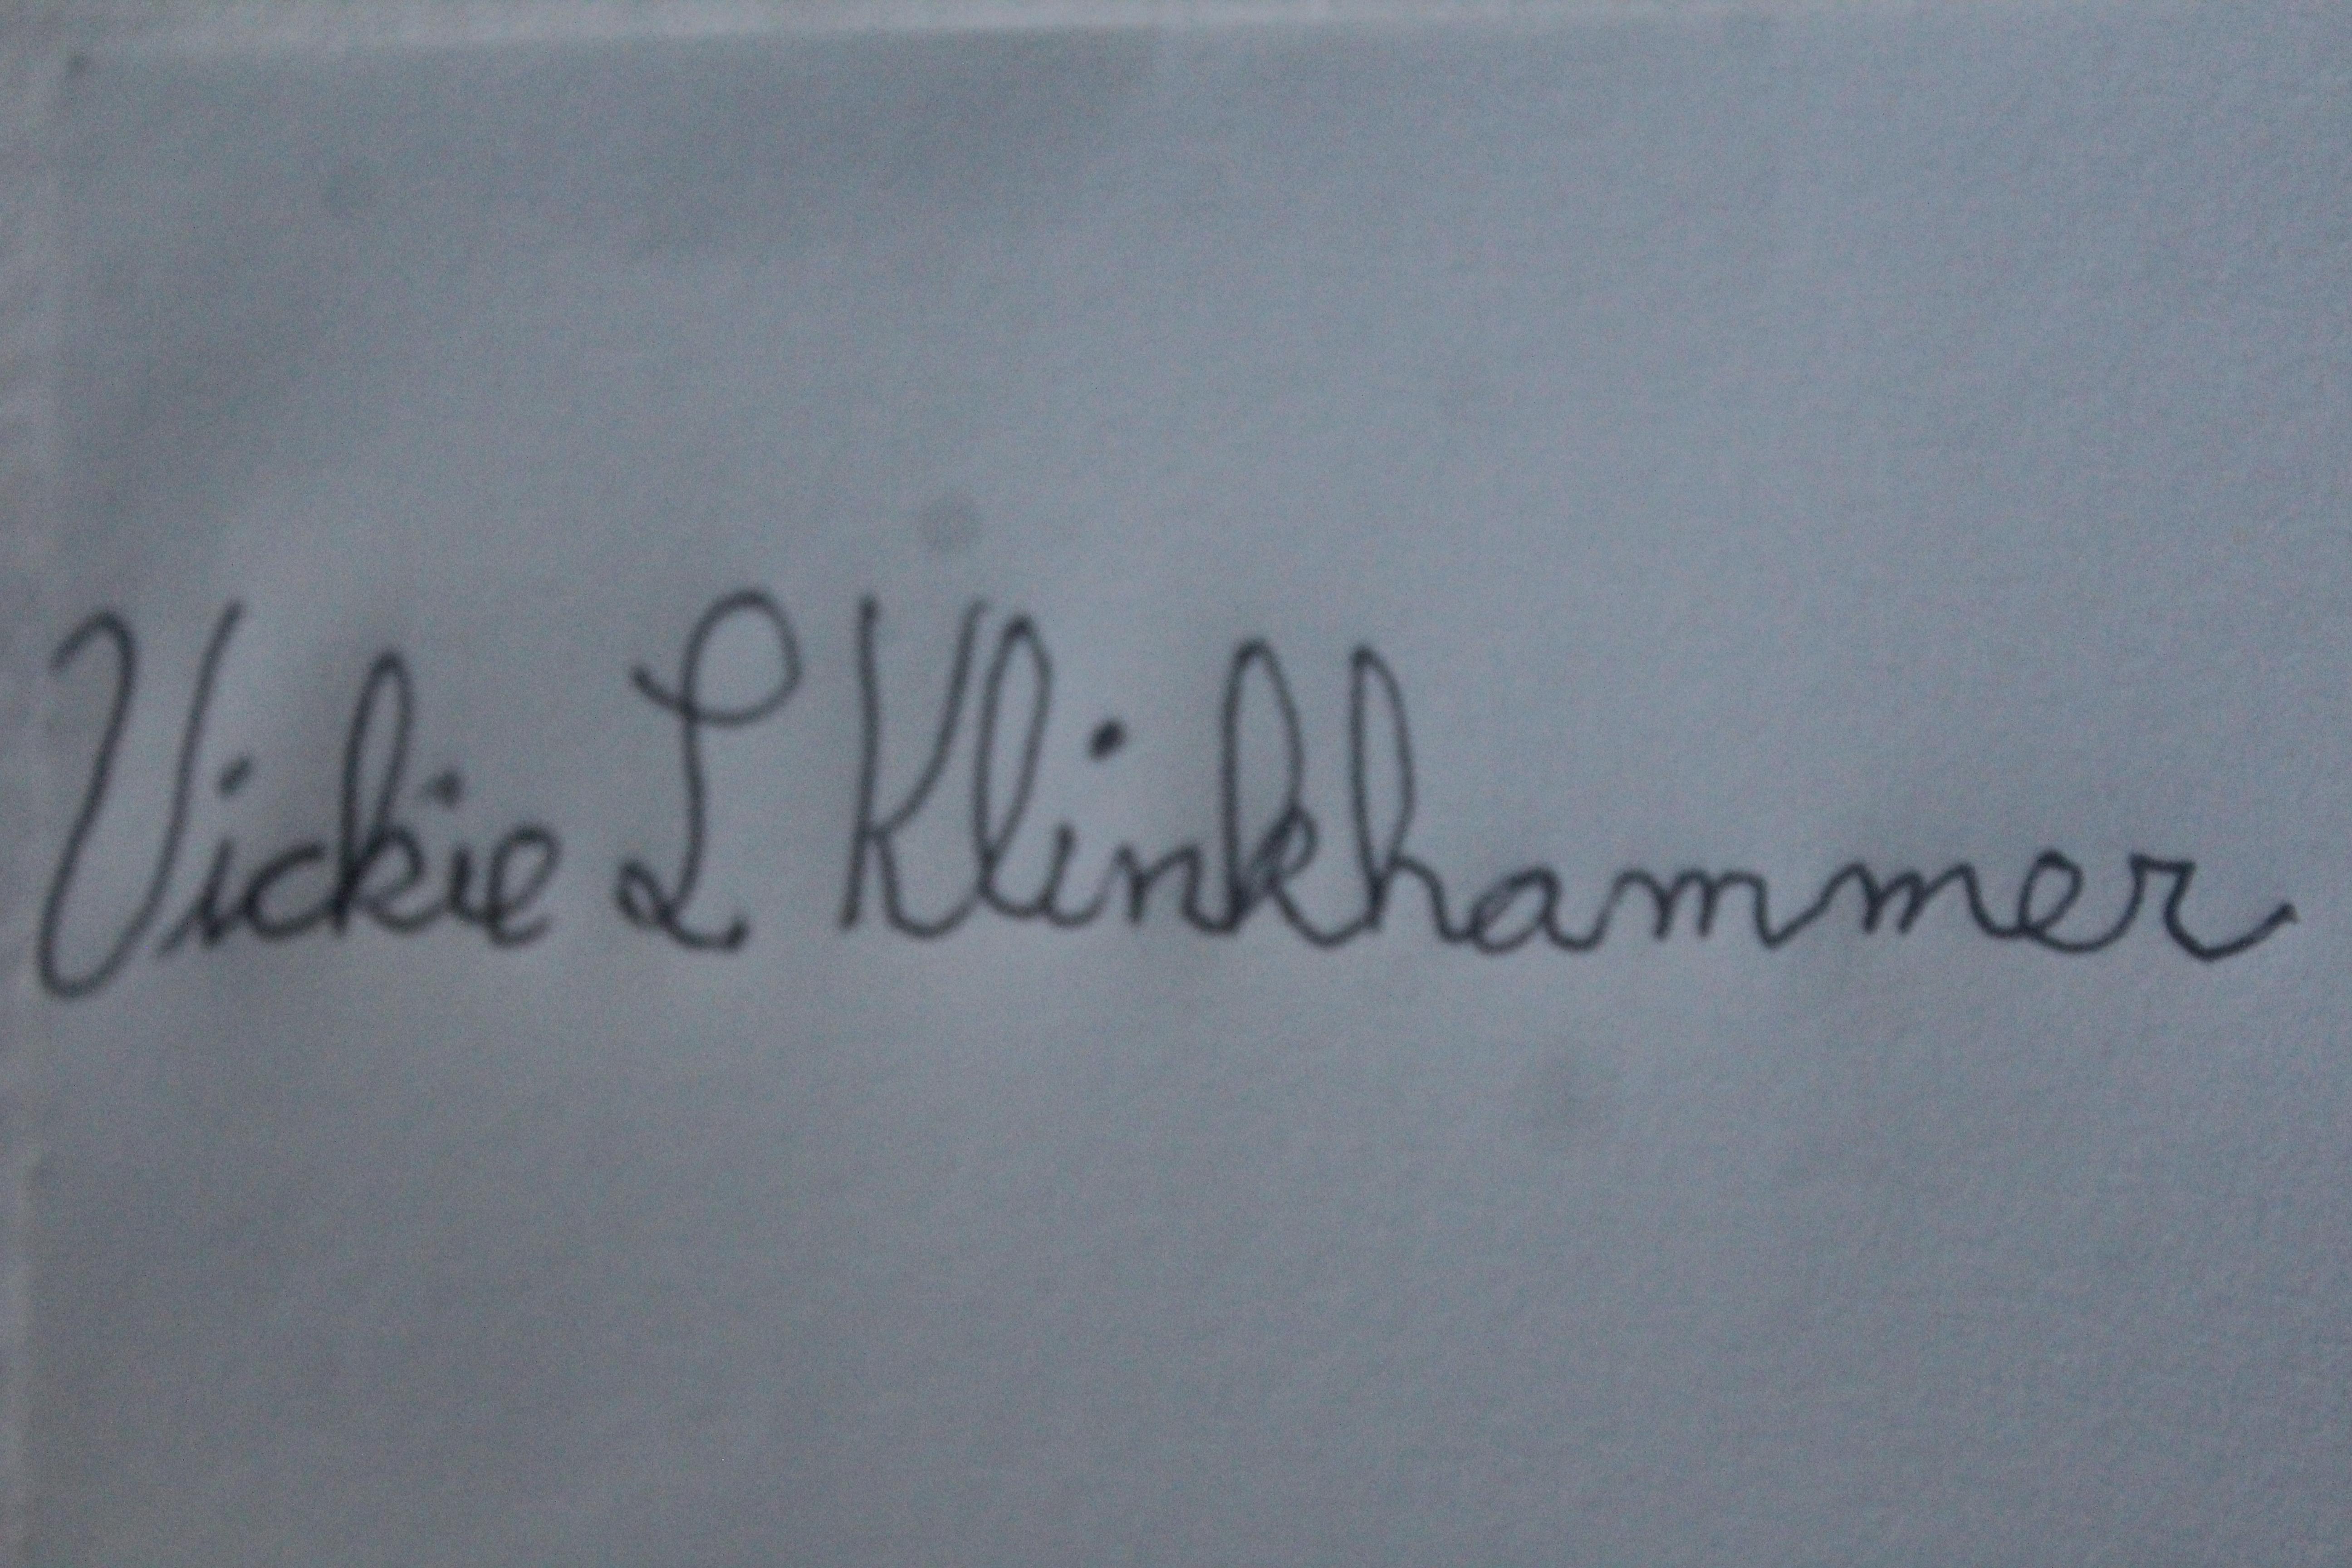 Vickie Klinkhammer Signature